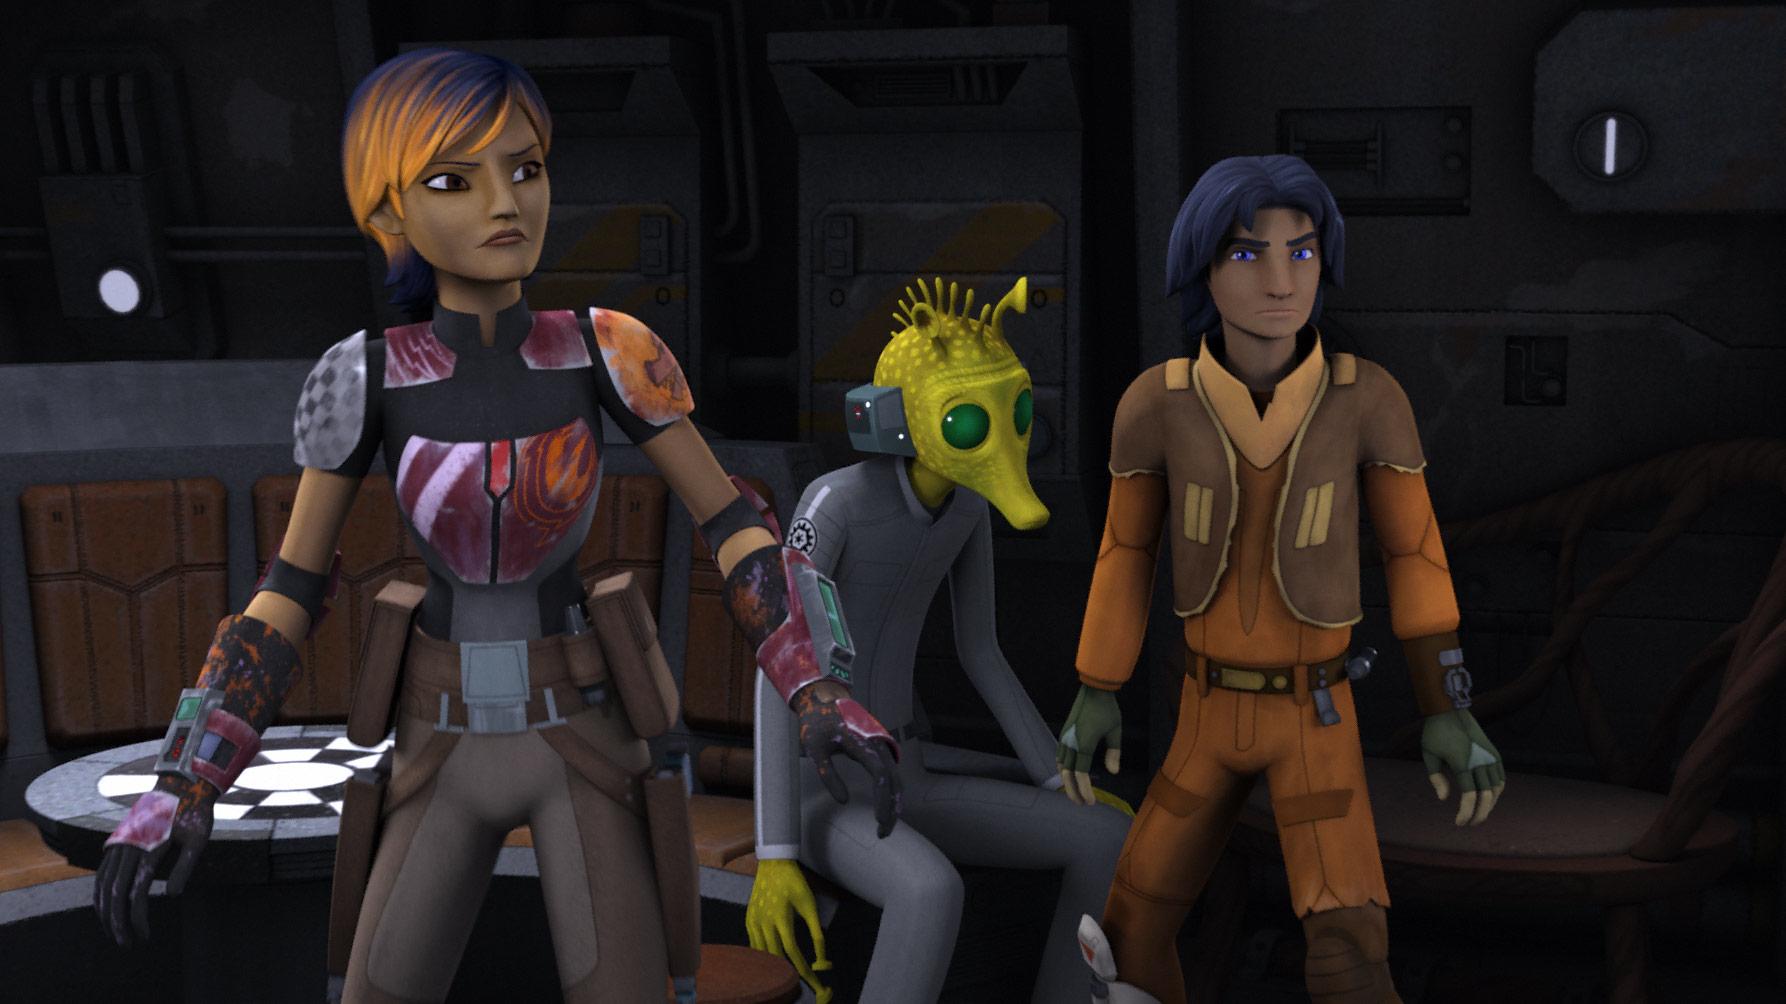 star wars rebels s01e08